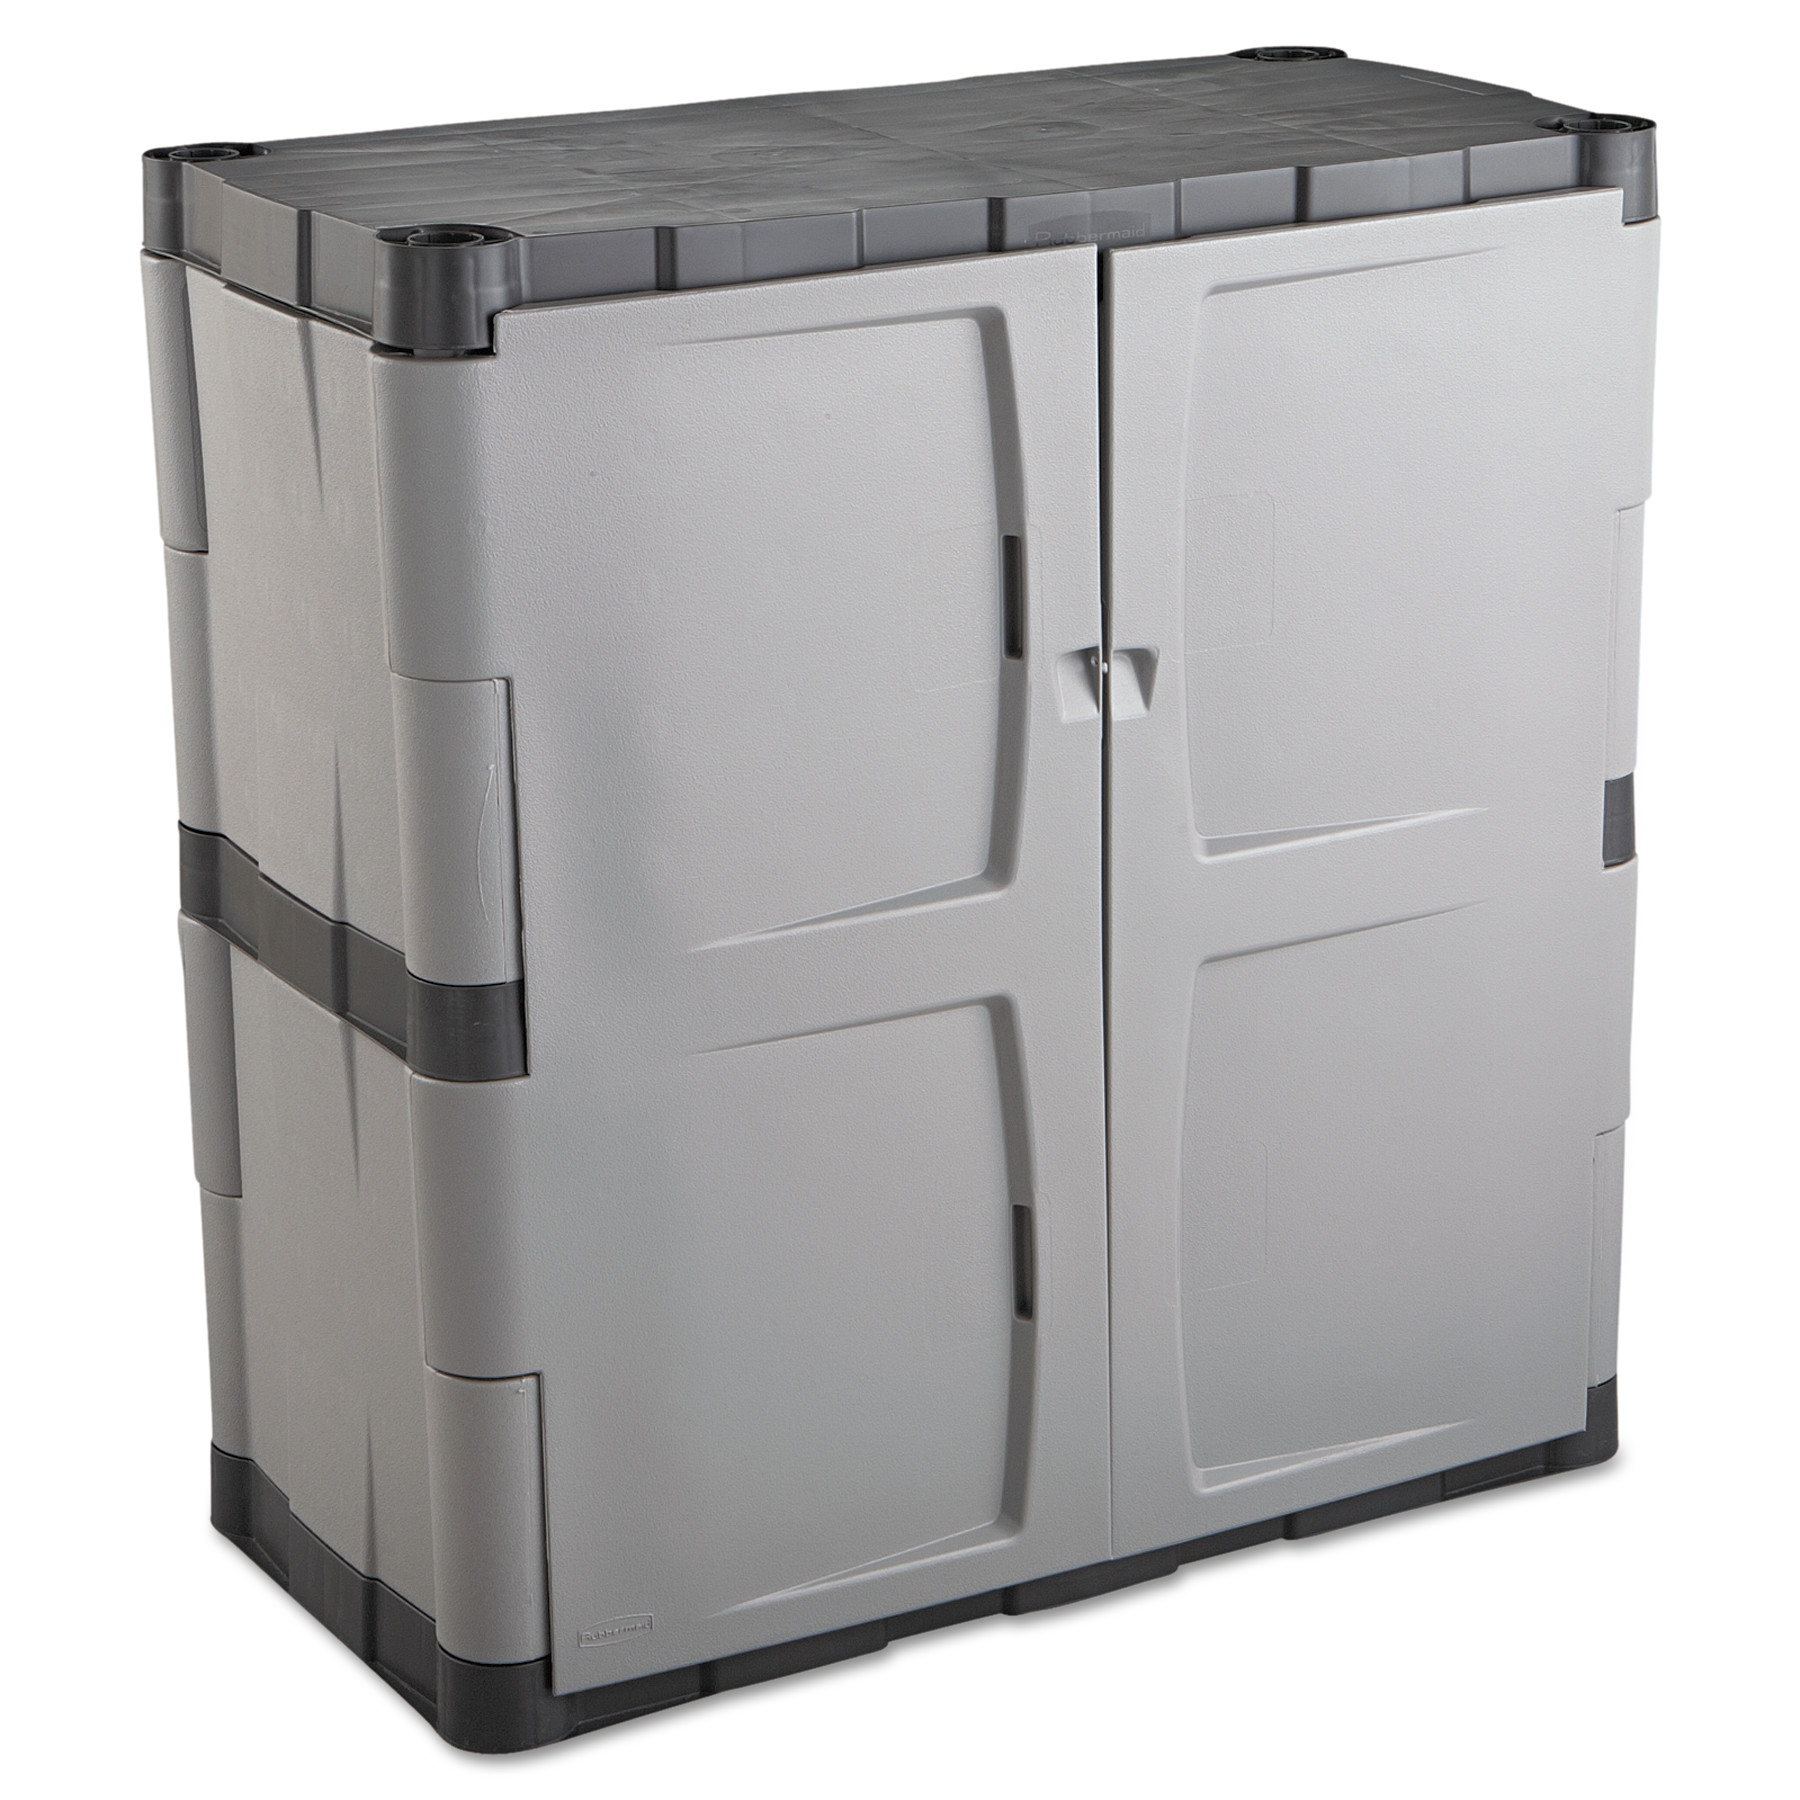 Rubbermaid Double-Door Storage Cabinet Base, 36w x 18d x 36h, Gray Black by Rubbermaid